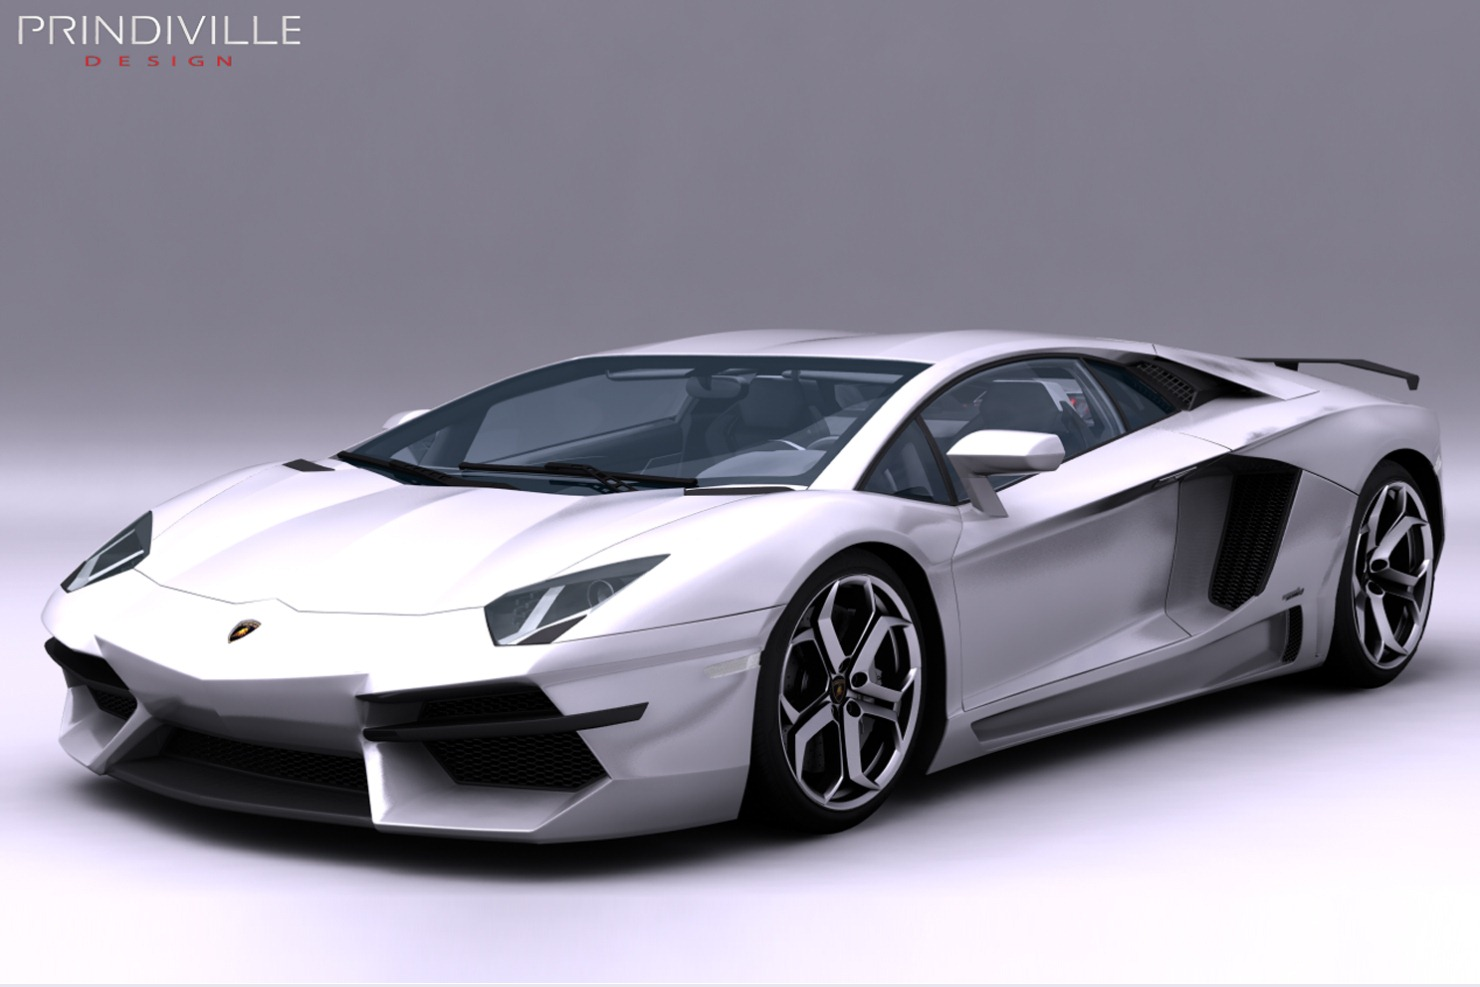 2012 Prindiville Lamborghini Aventador LP700-4